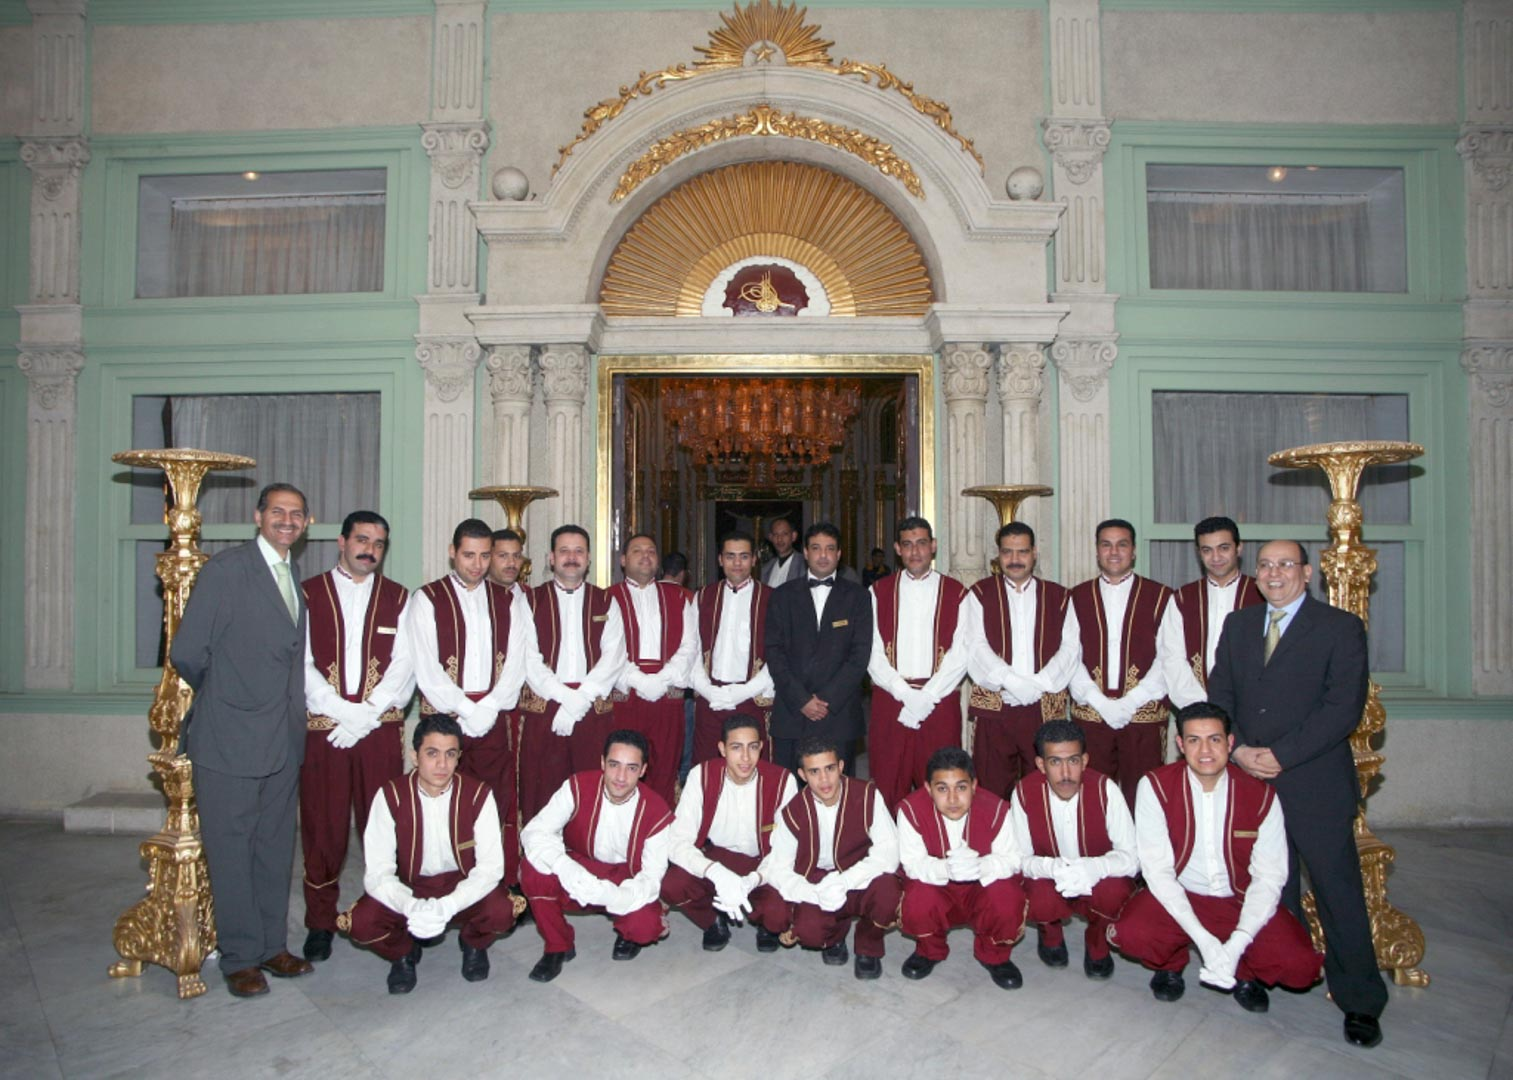 Raoucha Kandahar- Manial Palace - 360 Solutions (3).jpg